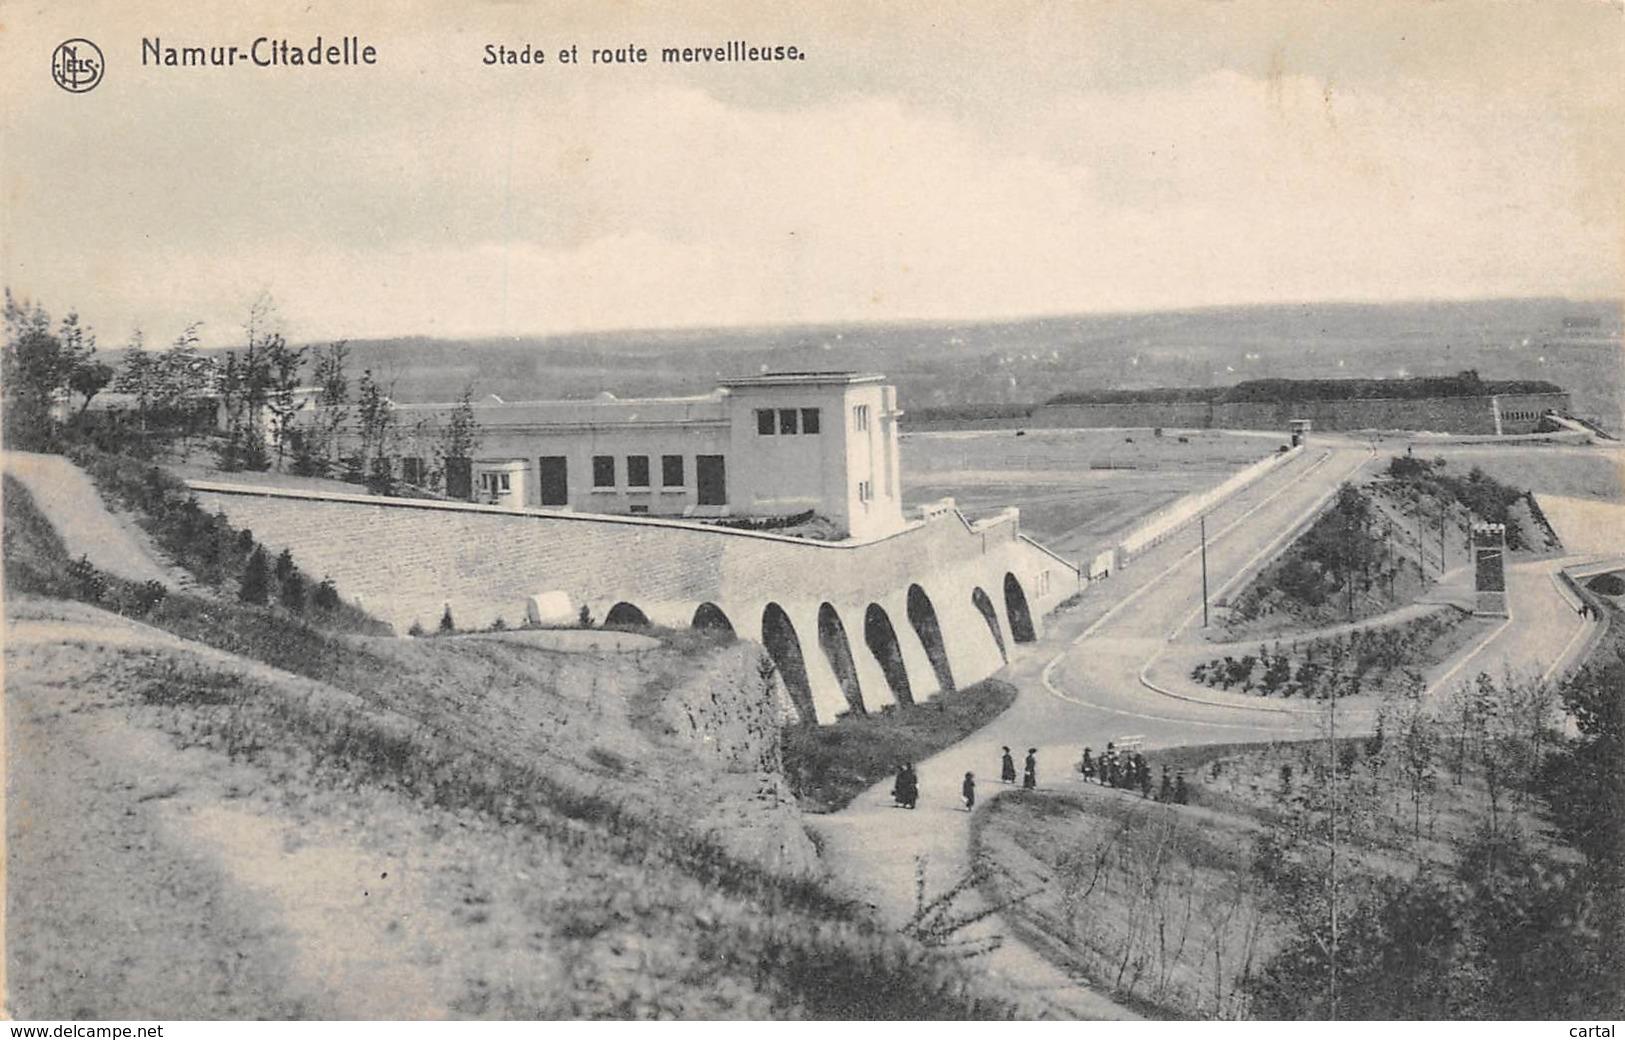 NAMUR-Citadelle - Stade Et Route Merveilleuse - Namur